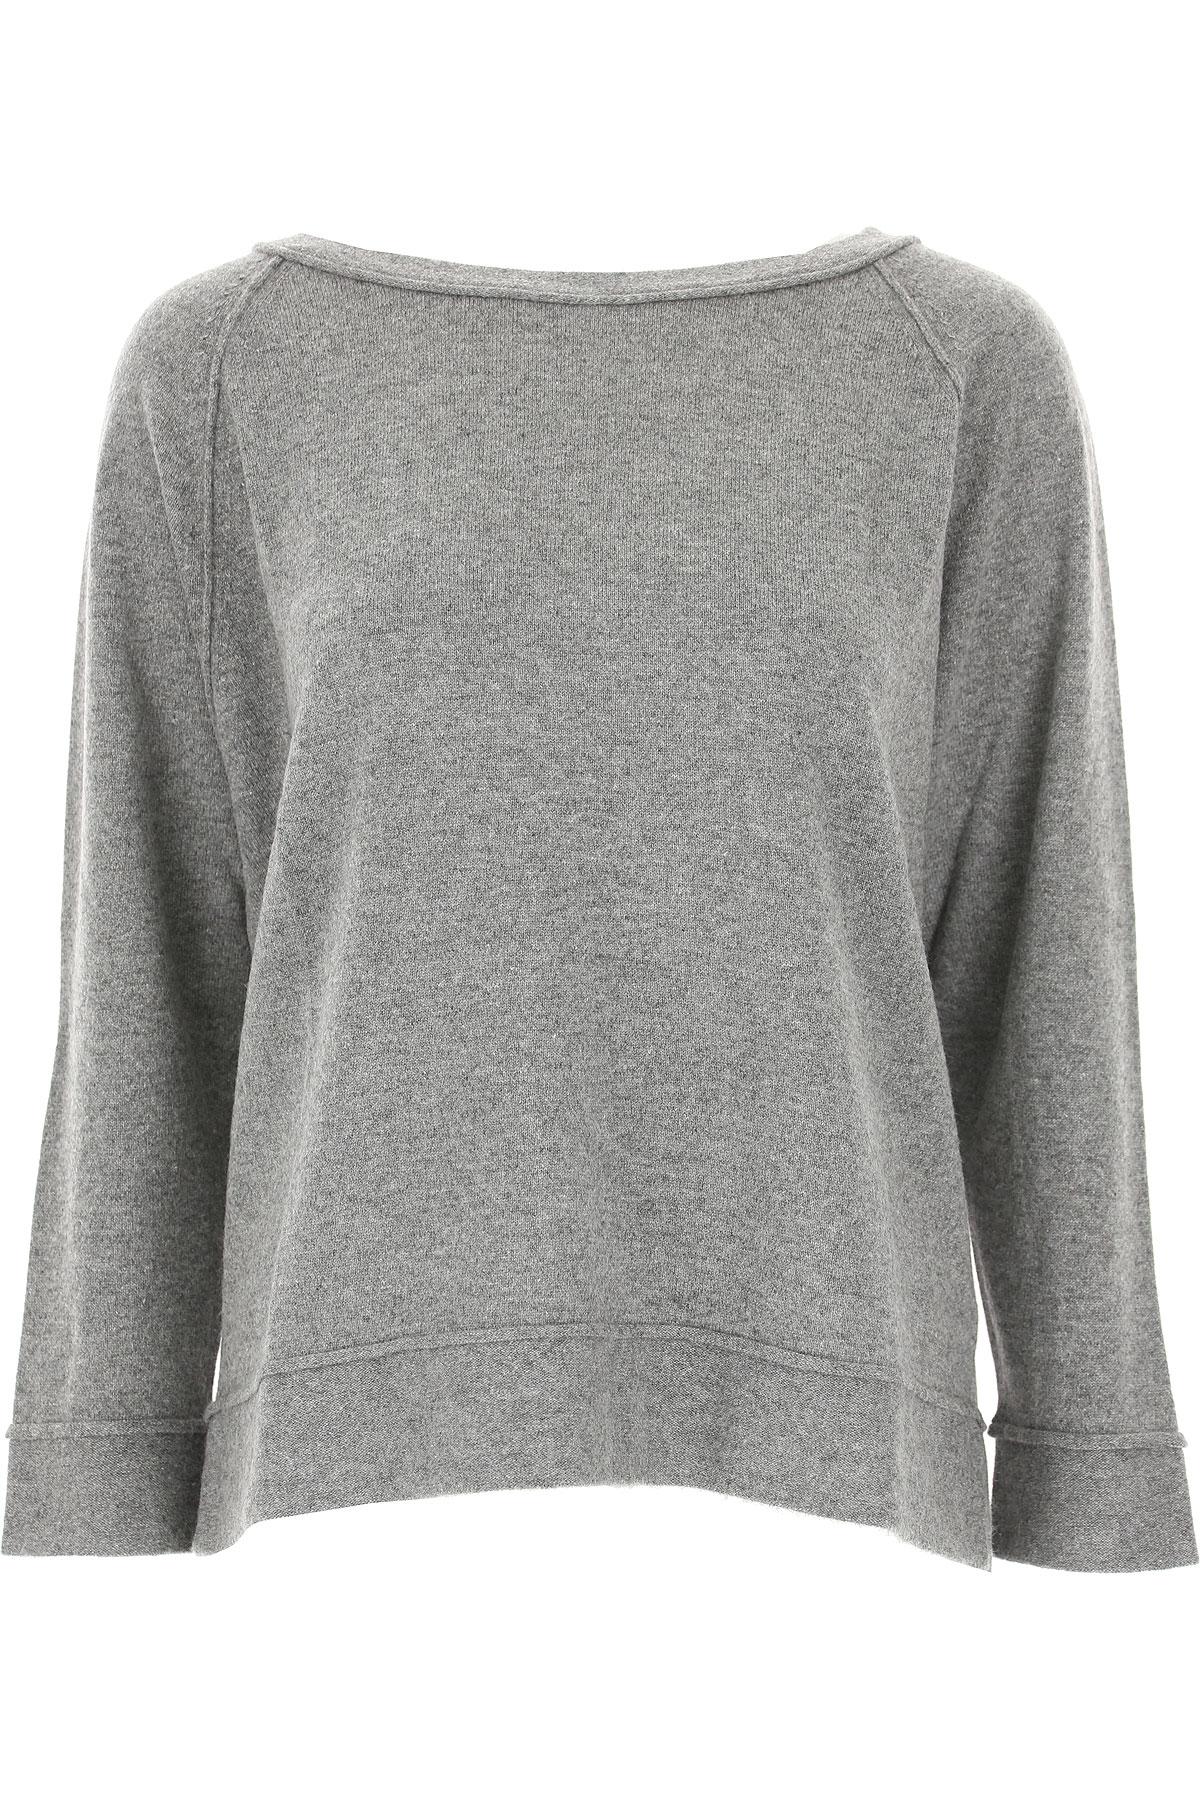 Image of Lamberto Losani Sweater for Women Jumper, Grey, Virgin wool, 2017, 4 8